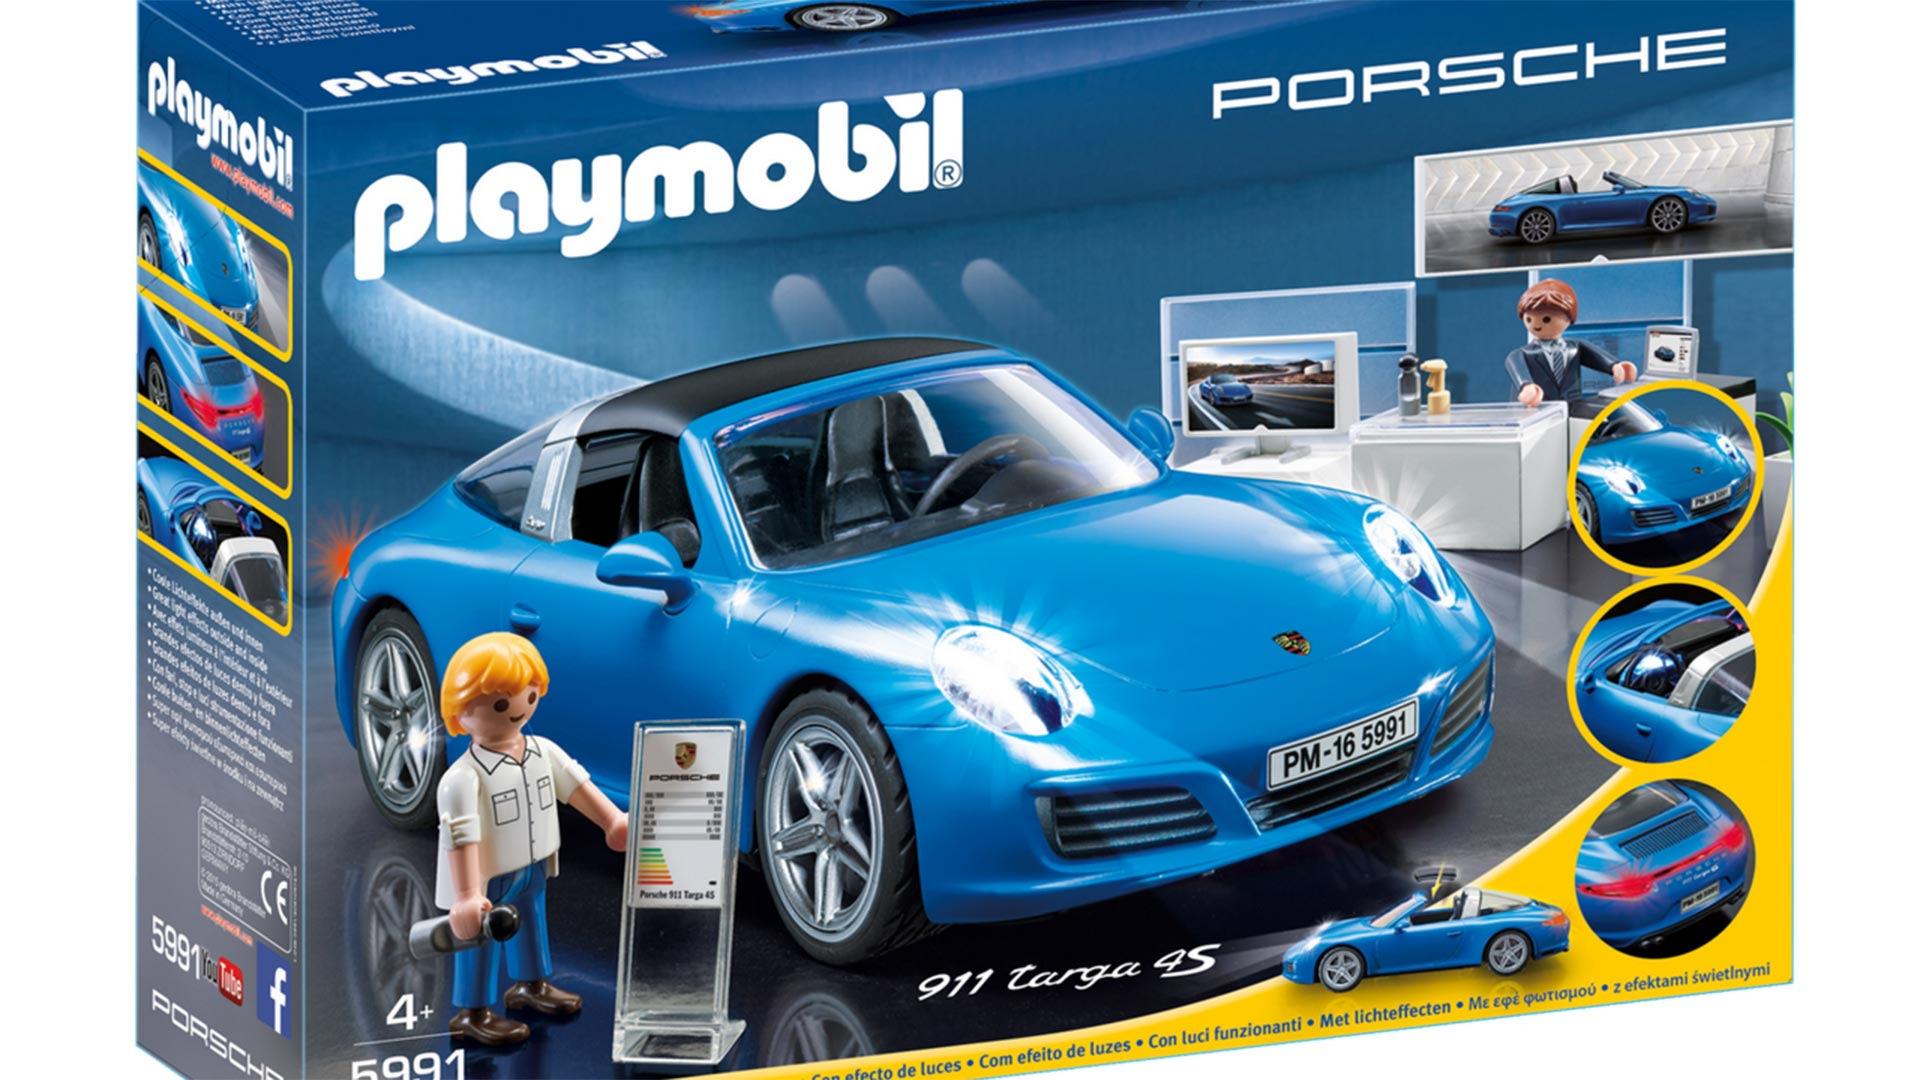 playmobil-porsche-911-targa-4s (6)